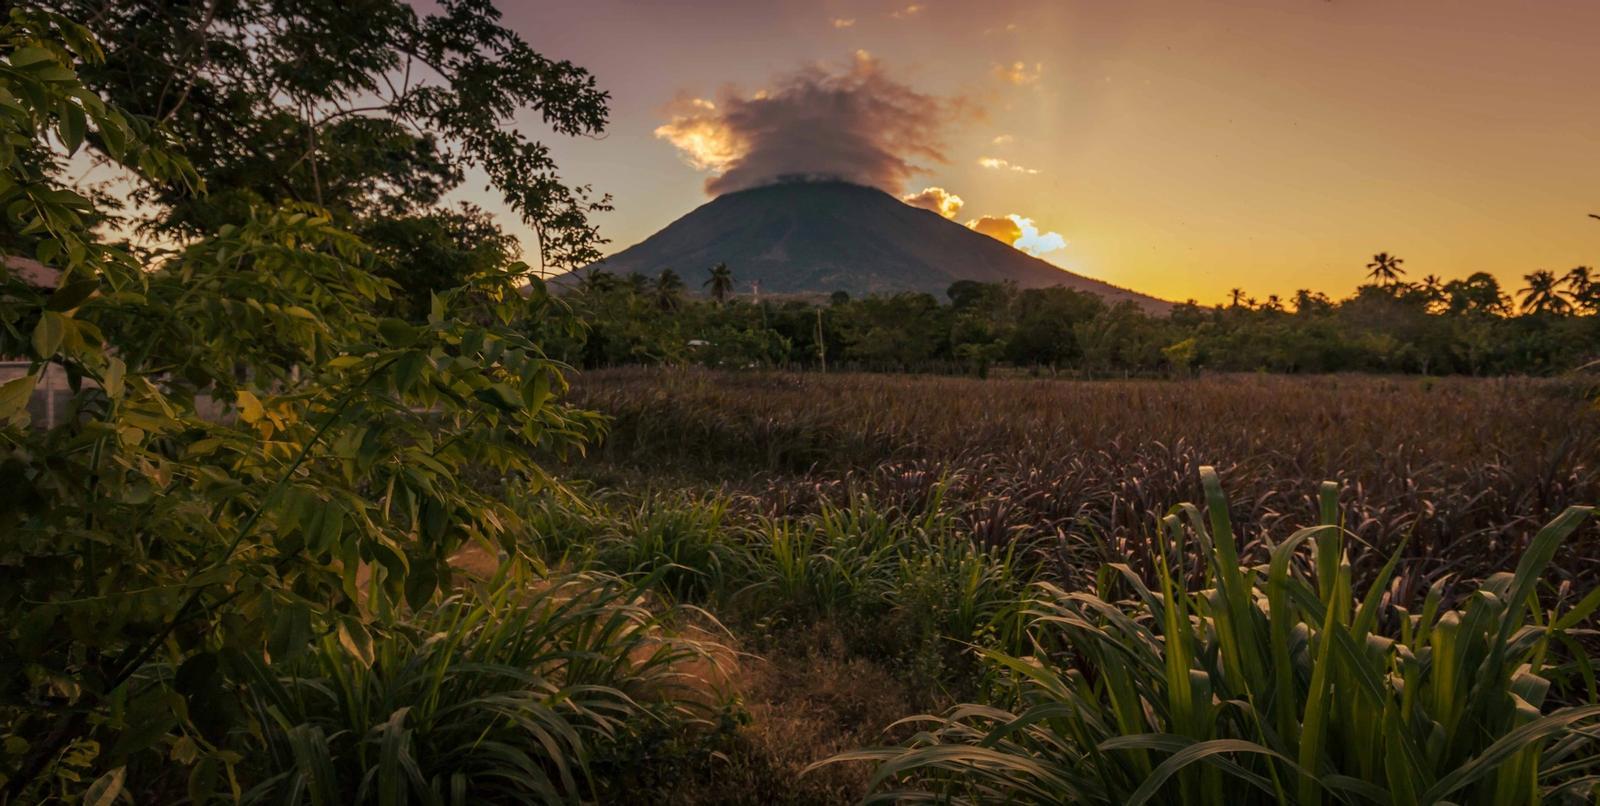 vulcano masaya al tramonto